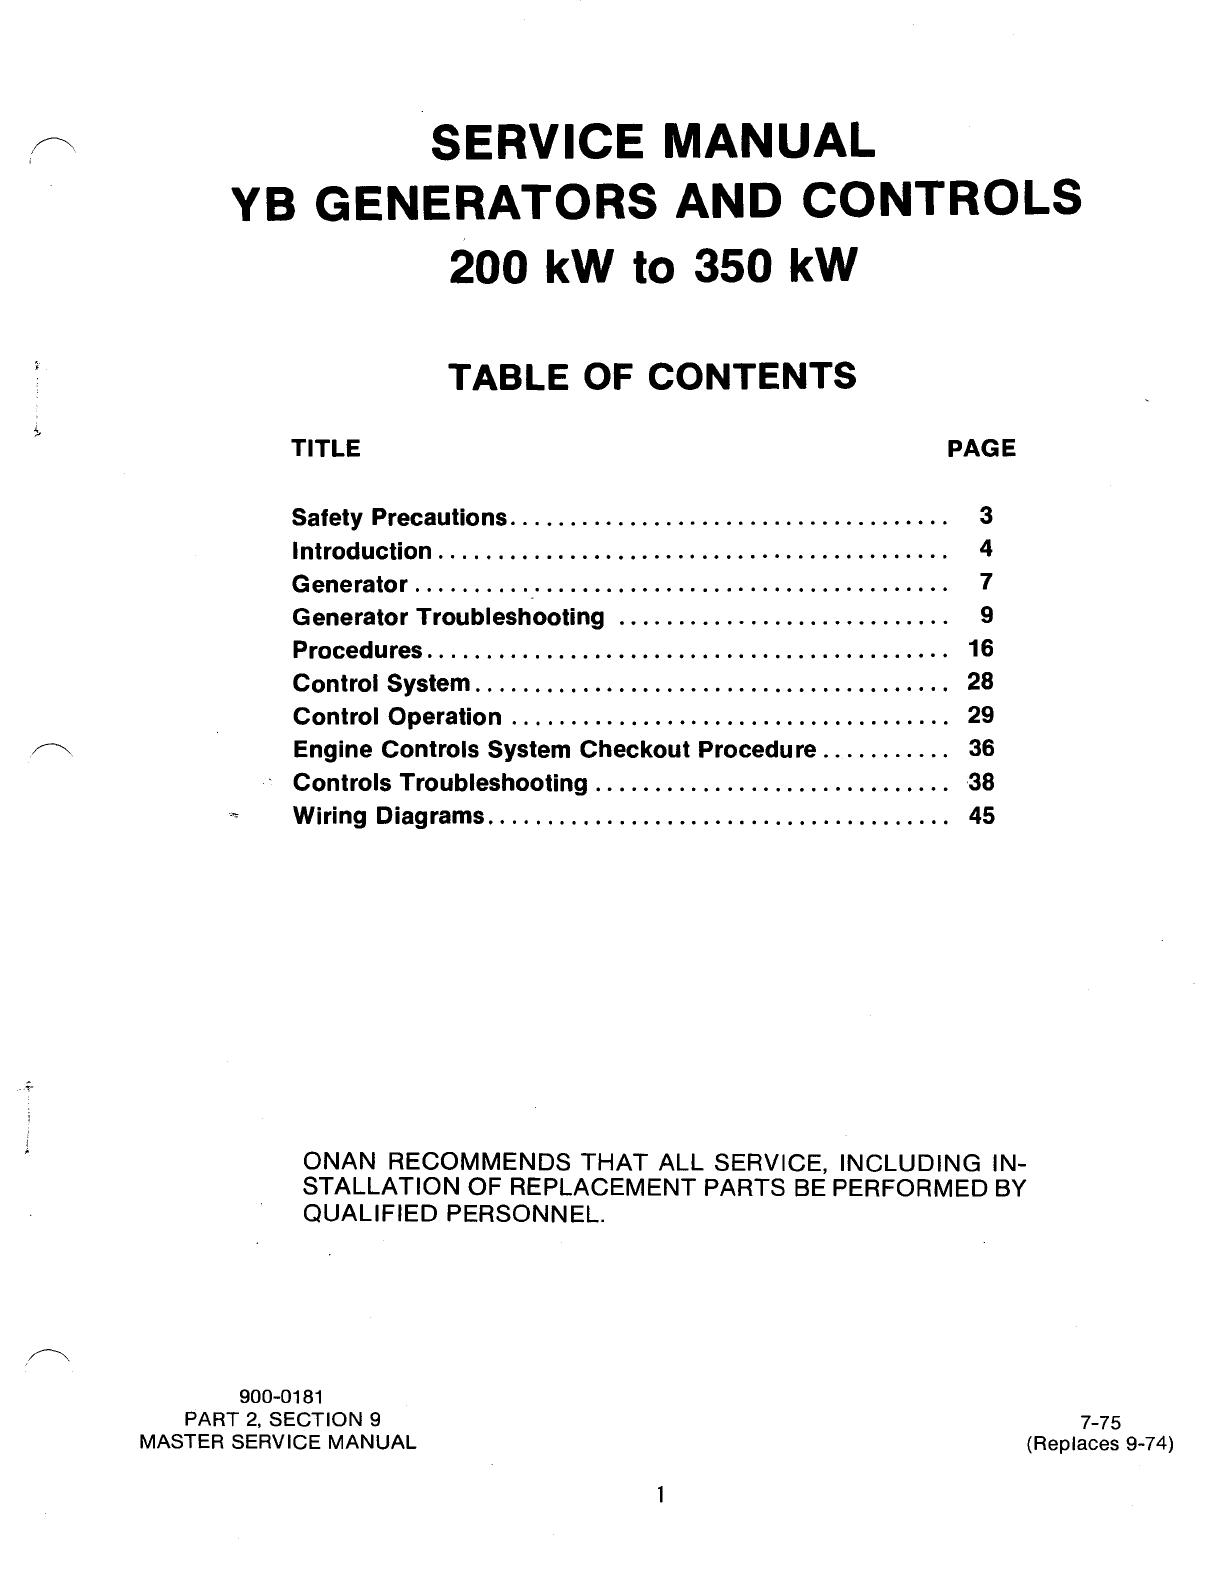 Onan Generator Troubleshooting Manual